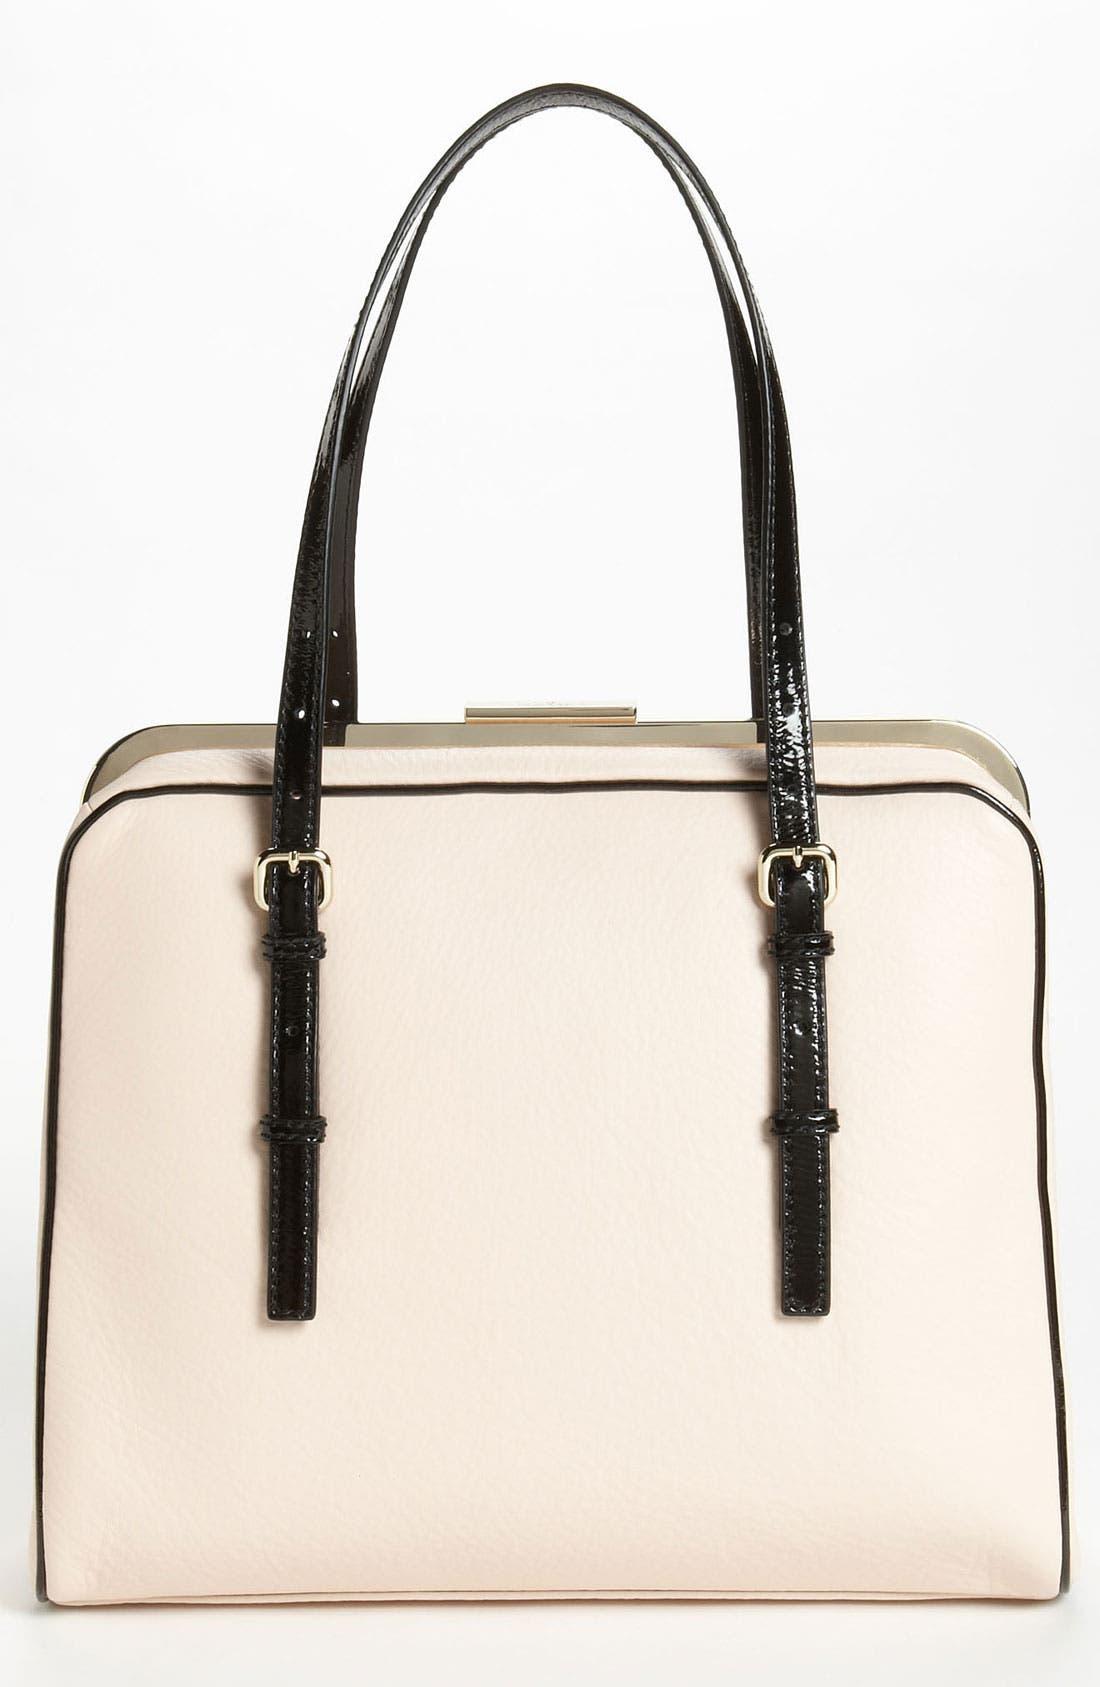 Alternate Image 1 Selected - kate spade new york 'parker place - margie' handbag